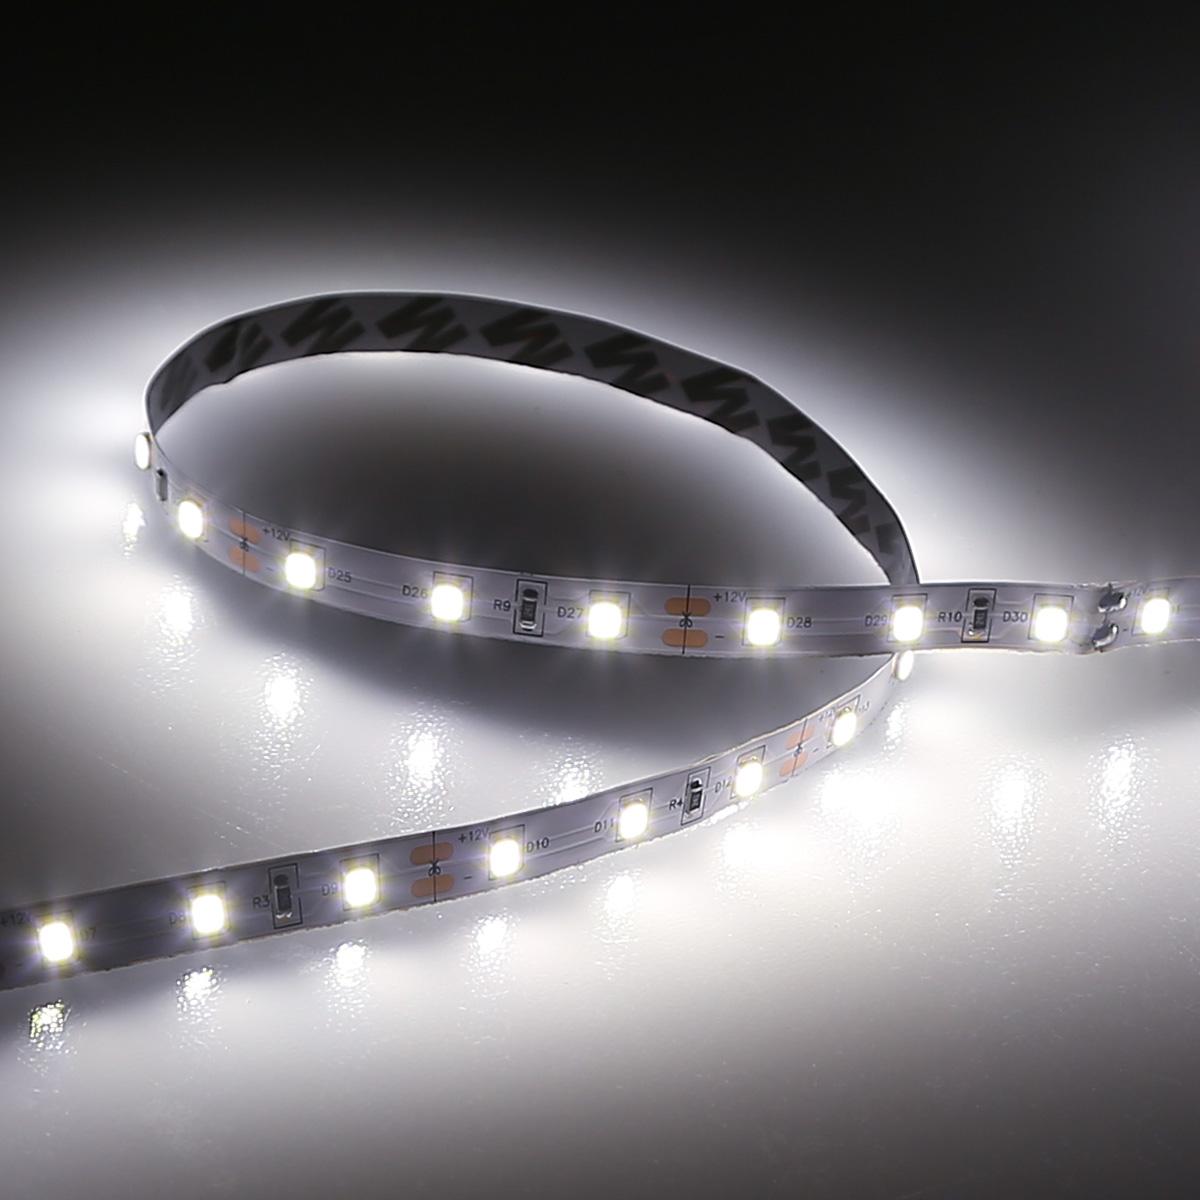 12 Volt Led Light Fixtures